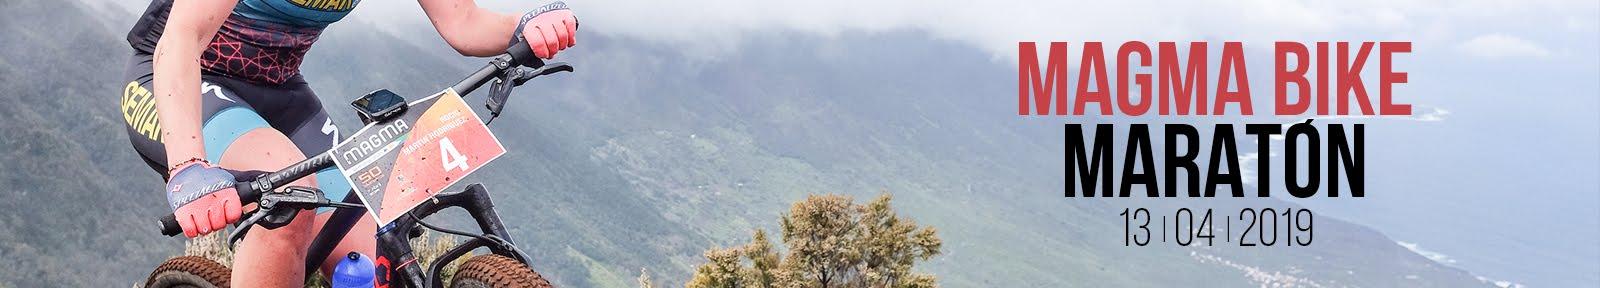 Magma Bike Maratón · Carrera de Mountain Bike (MTB) en Canarias